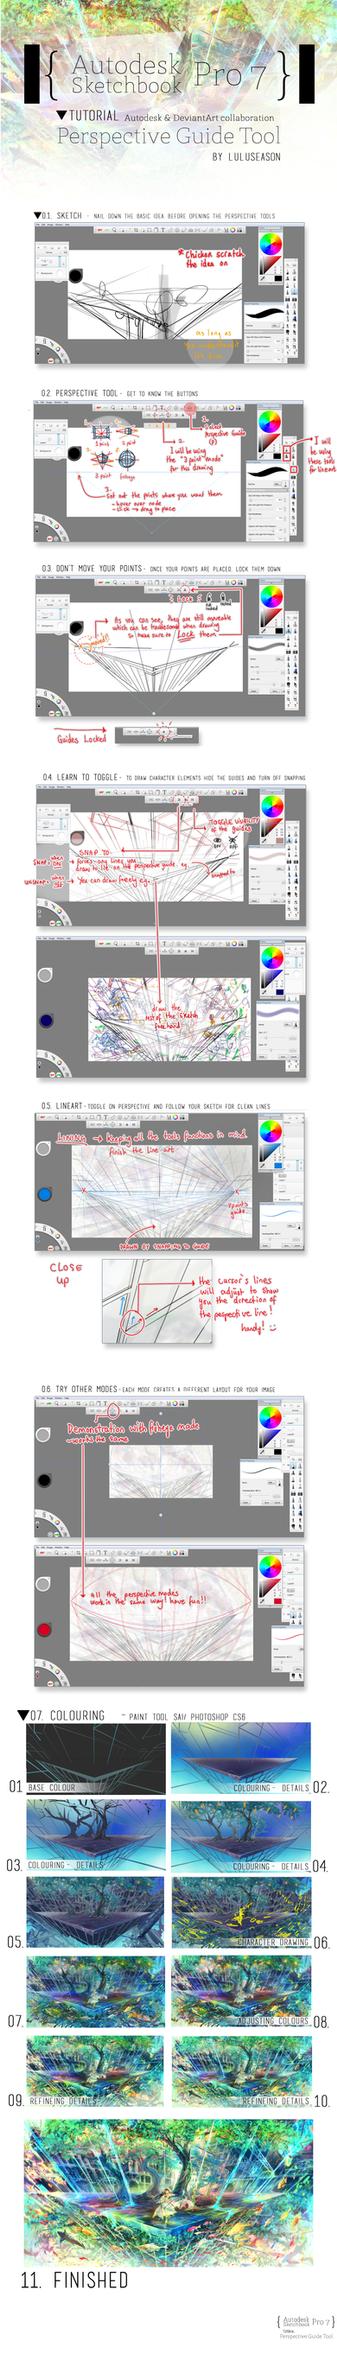 AUTODESK TUTORIAL- Perspective Guide Tool by LuluSeason